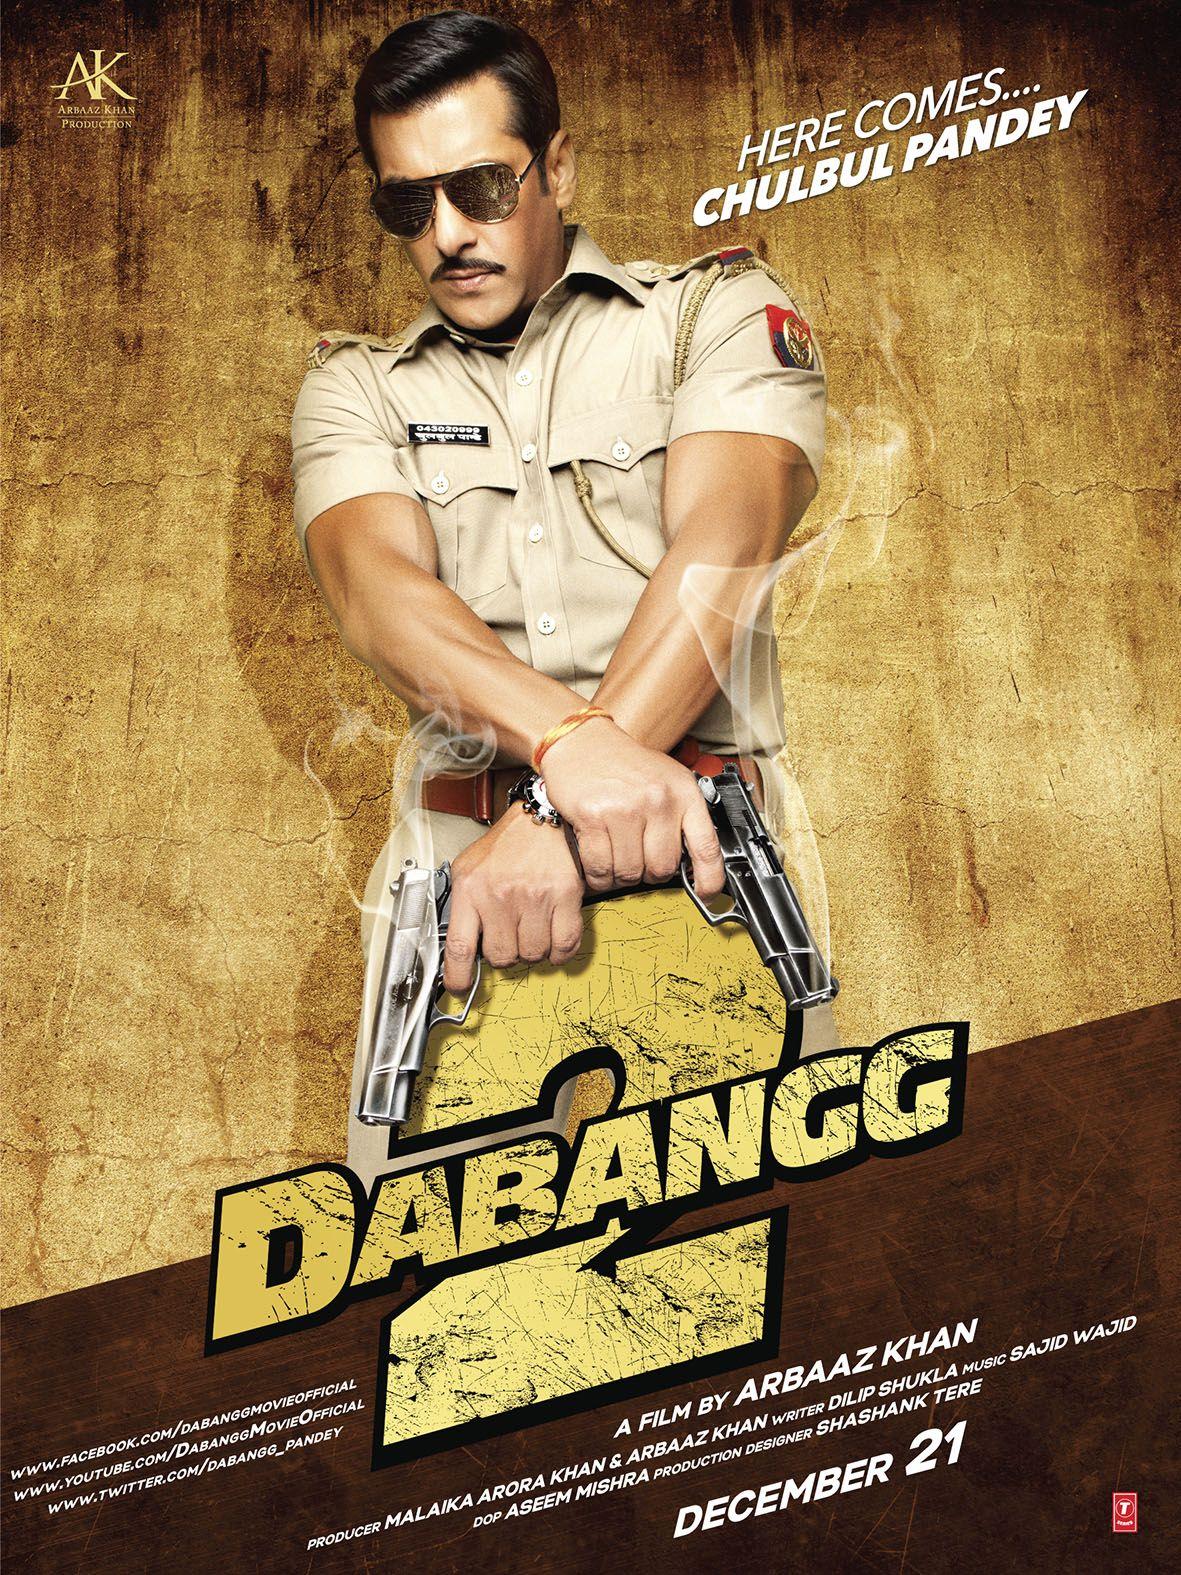 dabangg 2 salman khan hindi movie posters pinterest